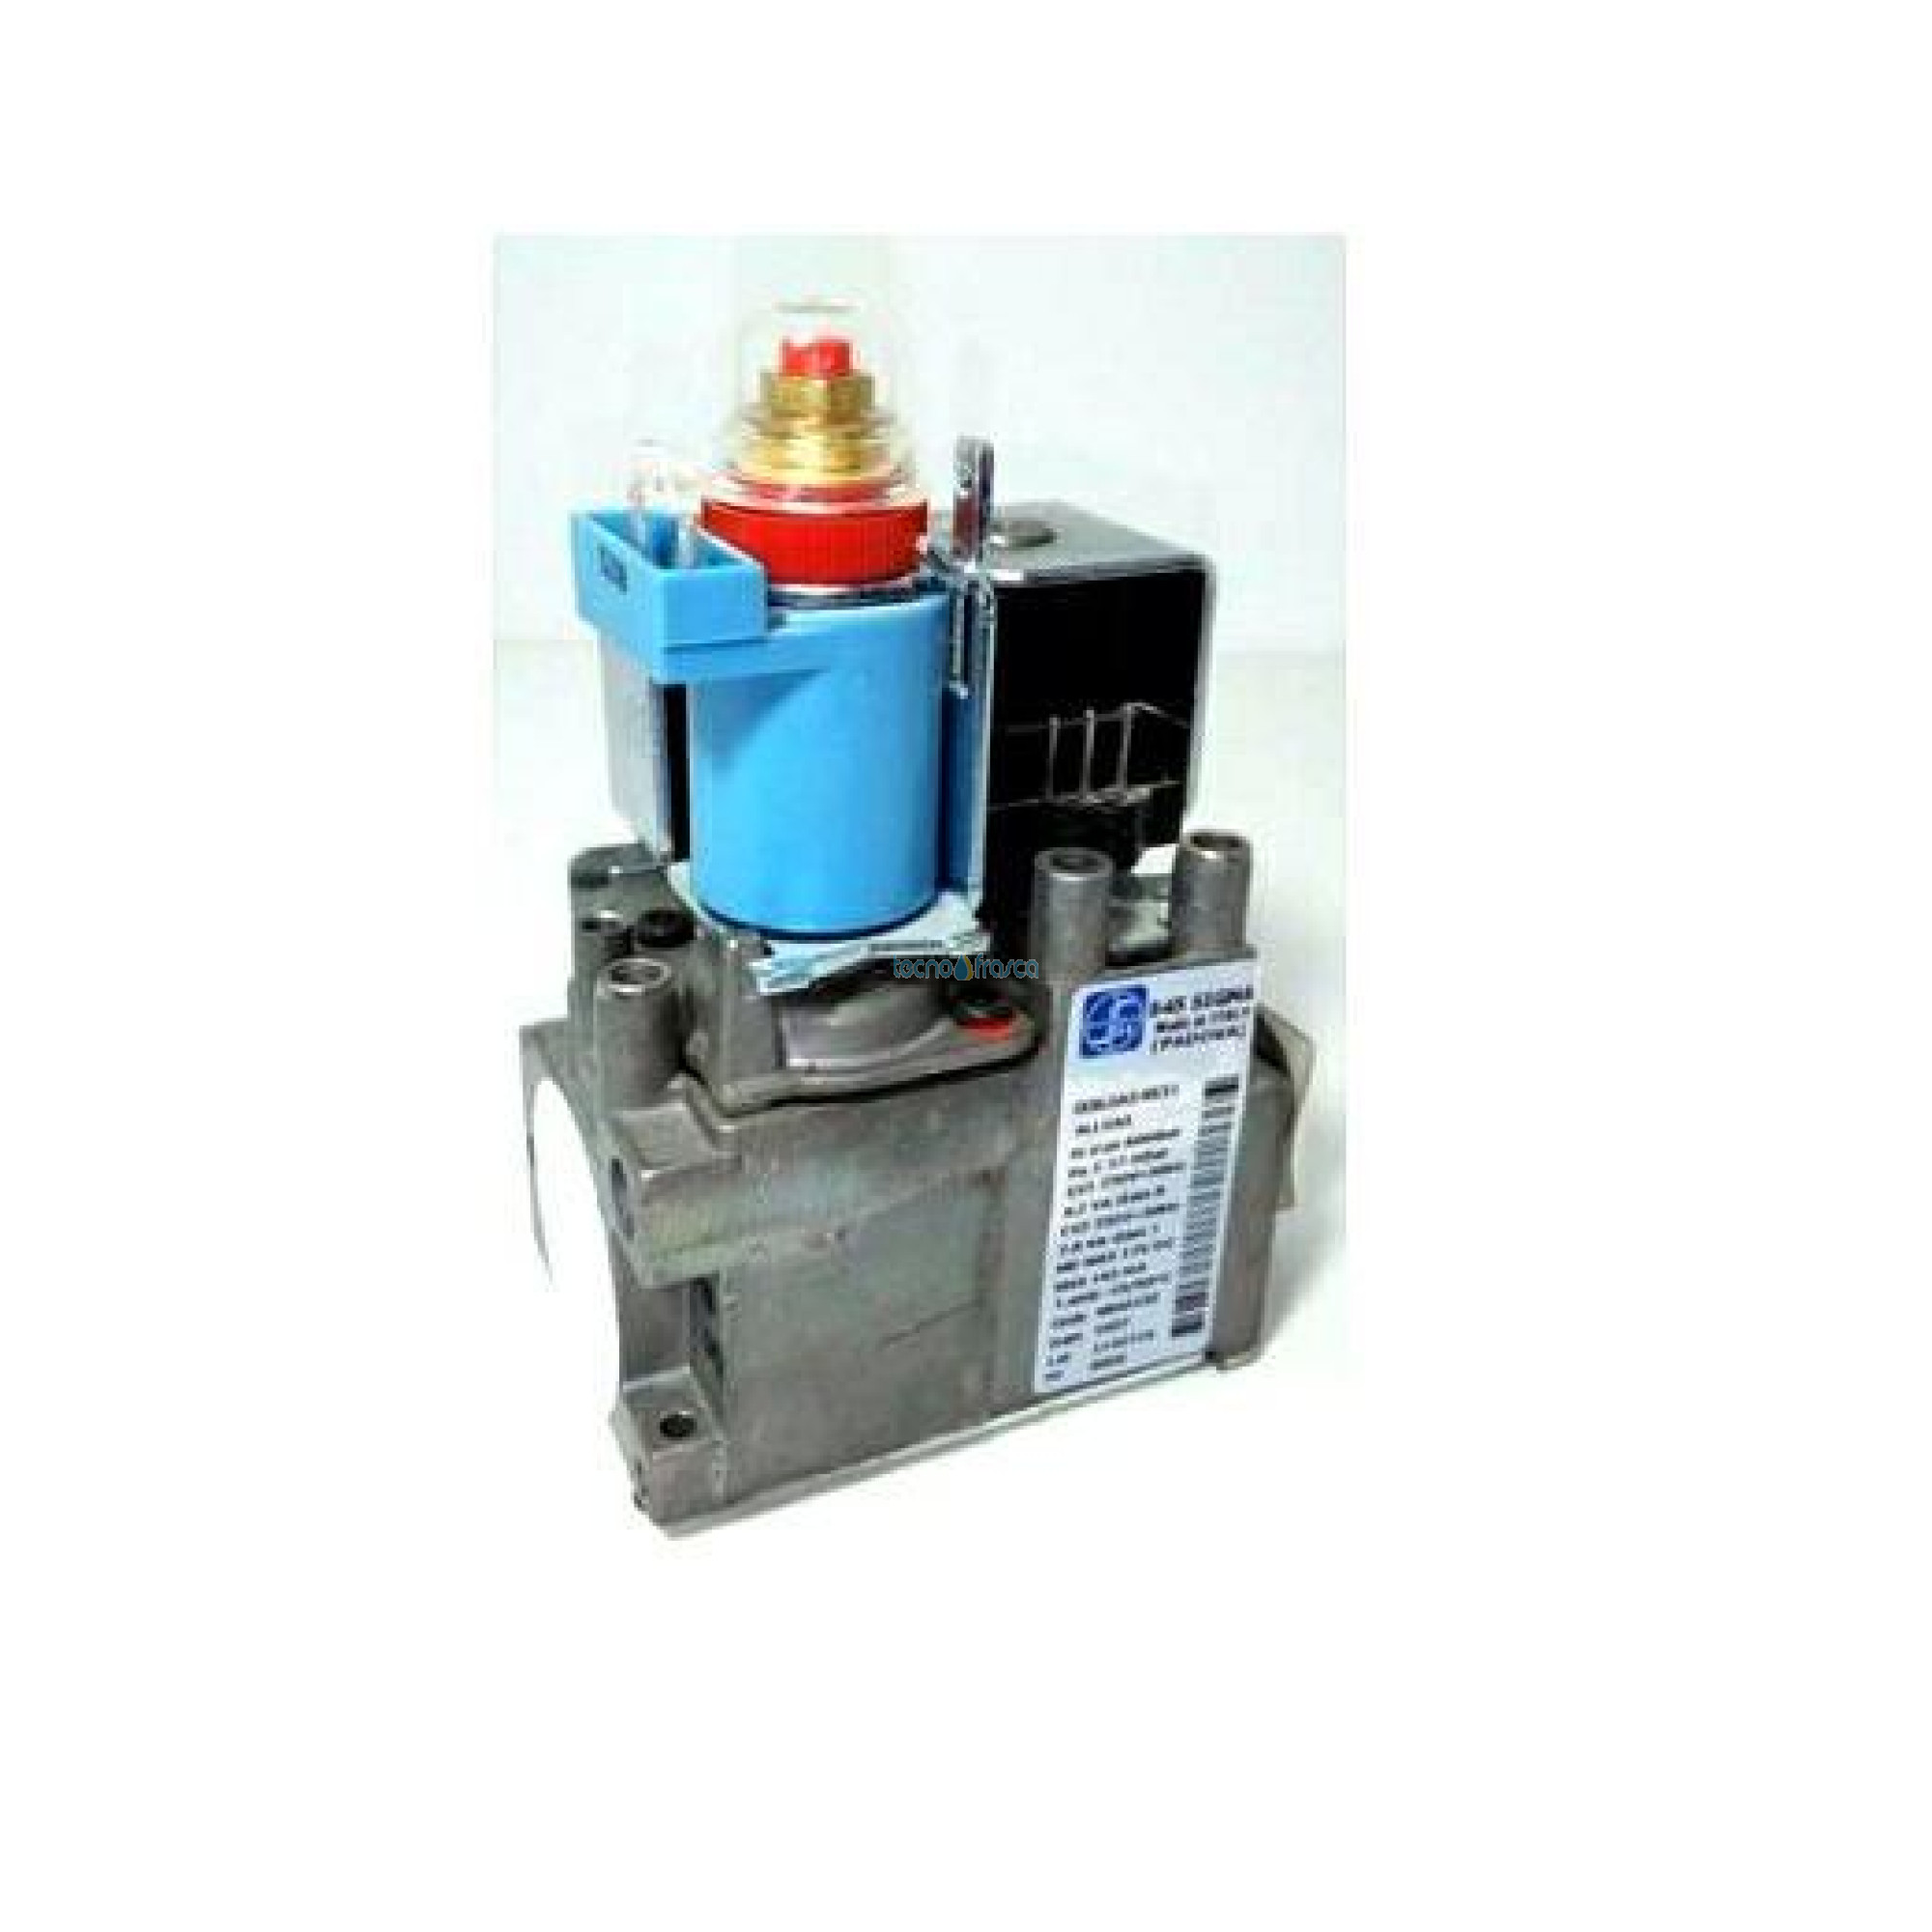 Sit valvola gas 845 sigma 0845132